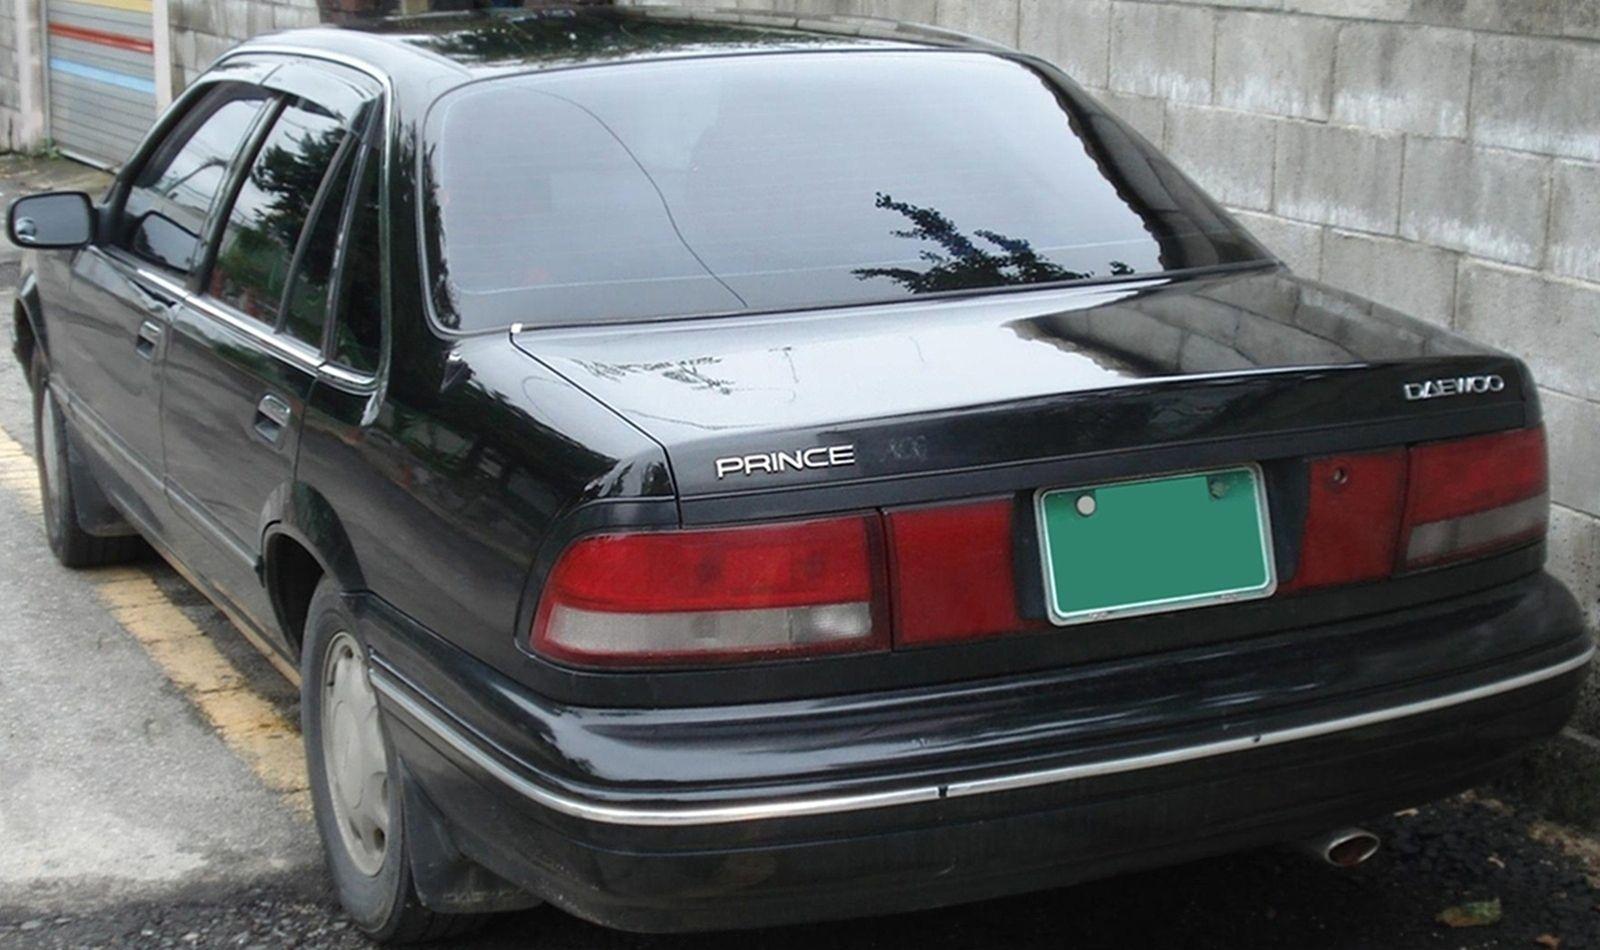 black daewoo prince 4 5 photos 1 car pinterest cars rh pinterest com Daewoo Racer Daewoo Prince 1989